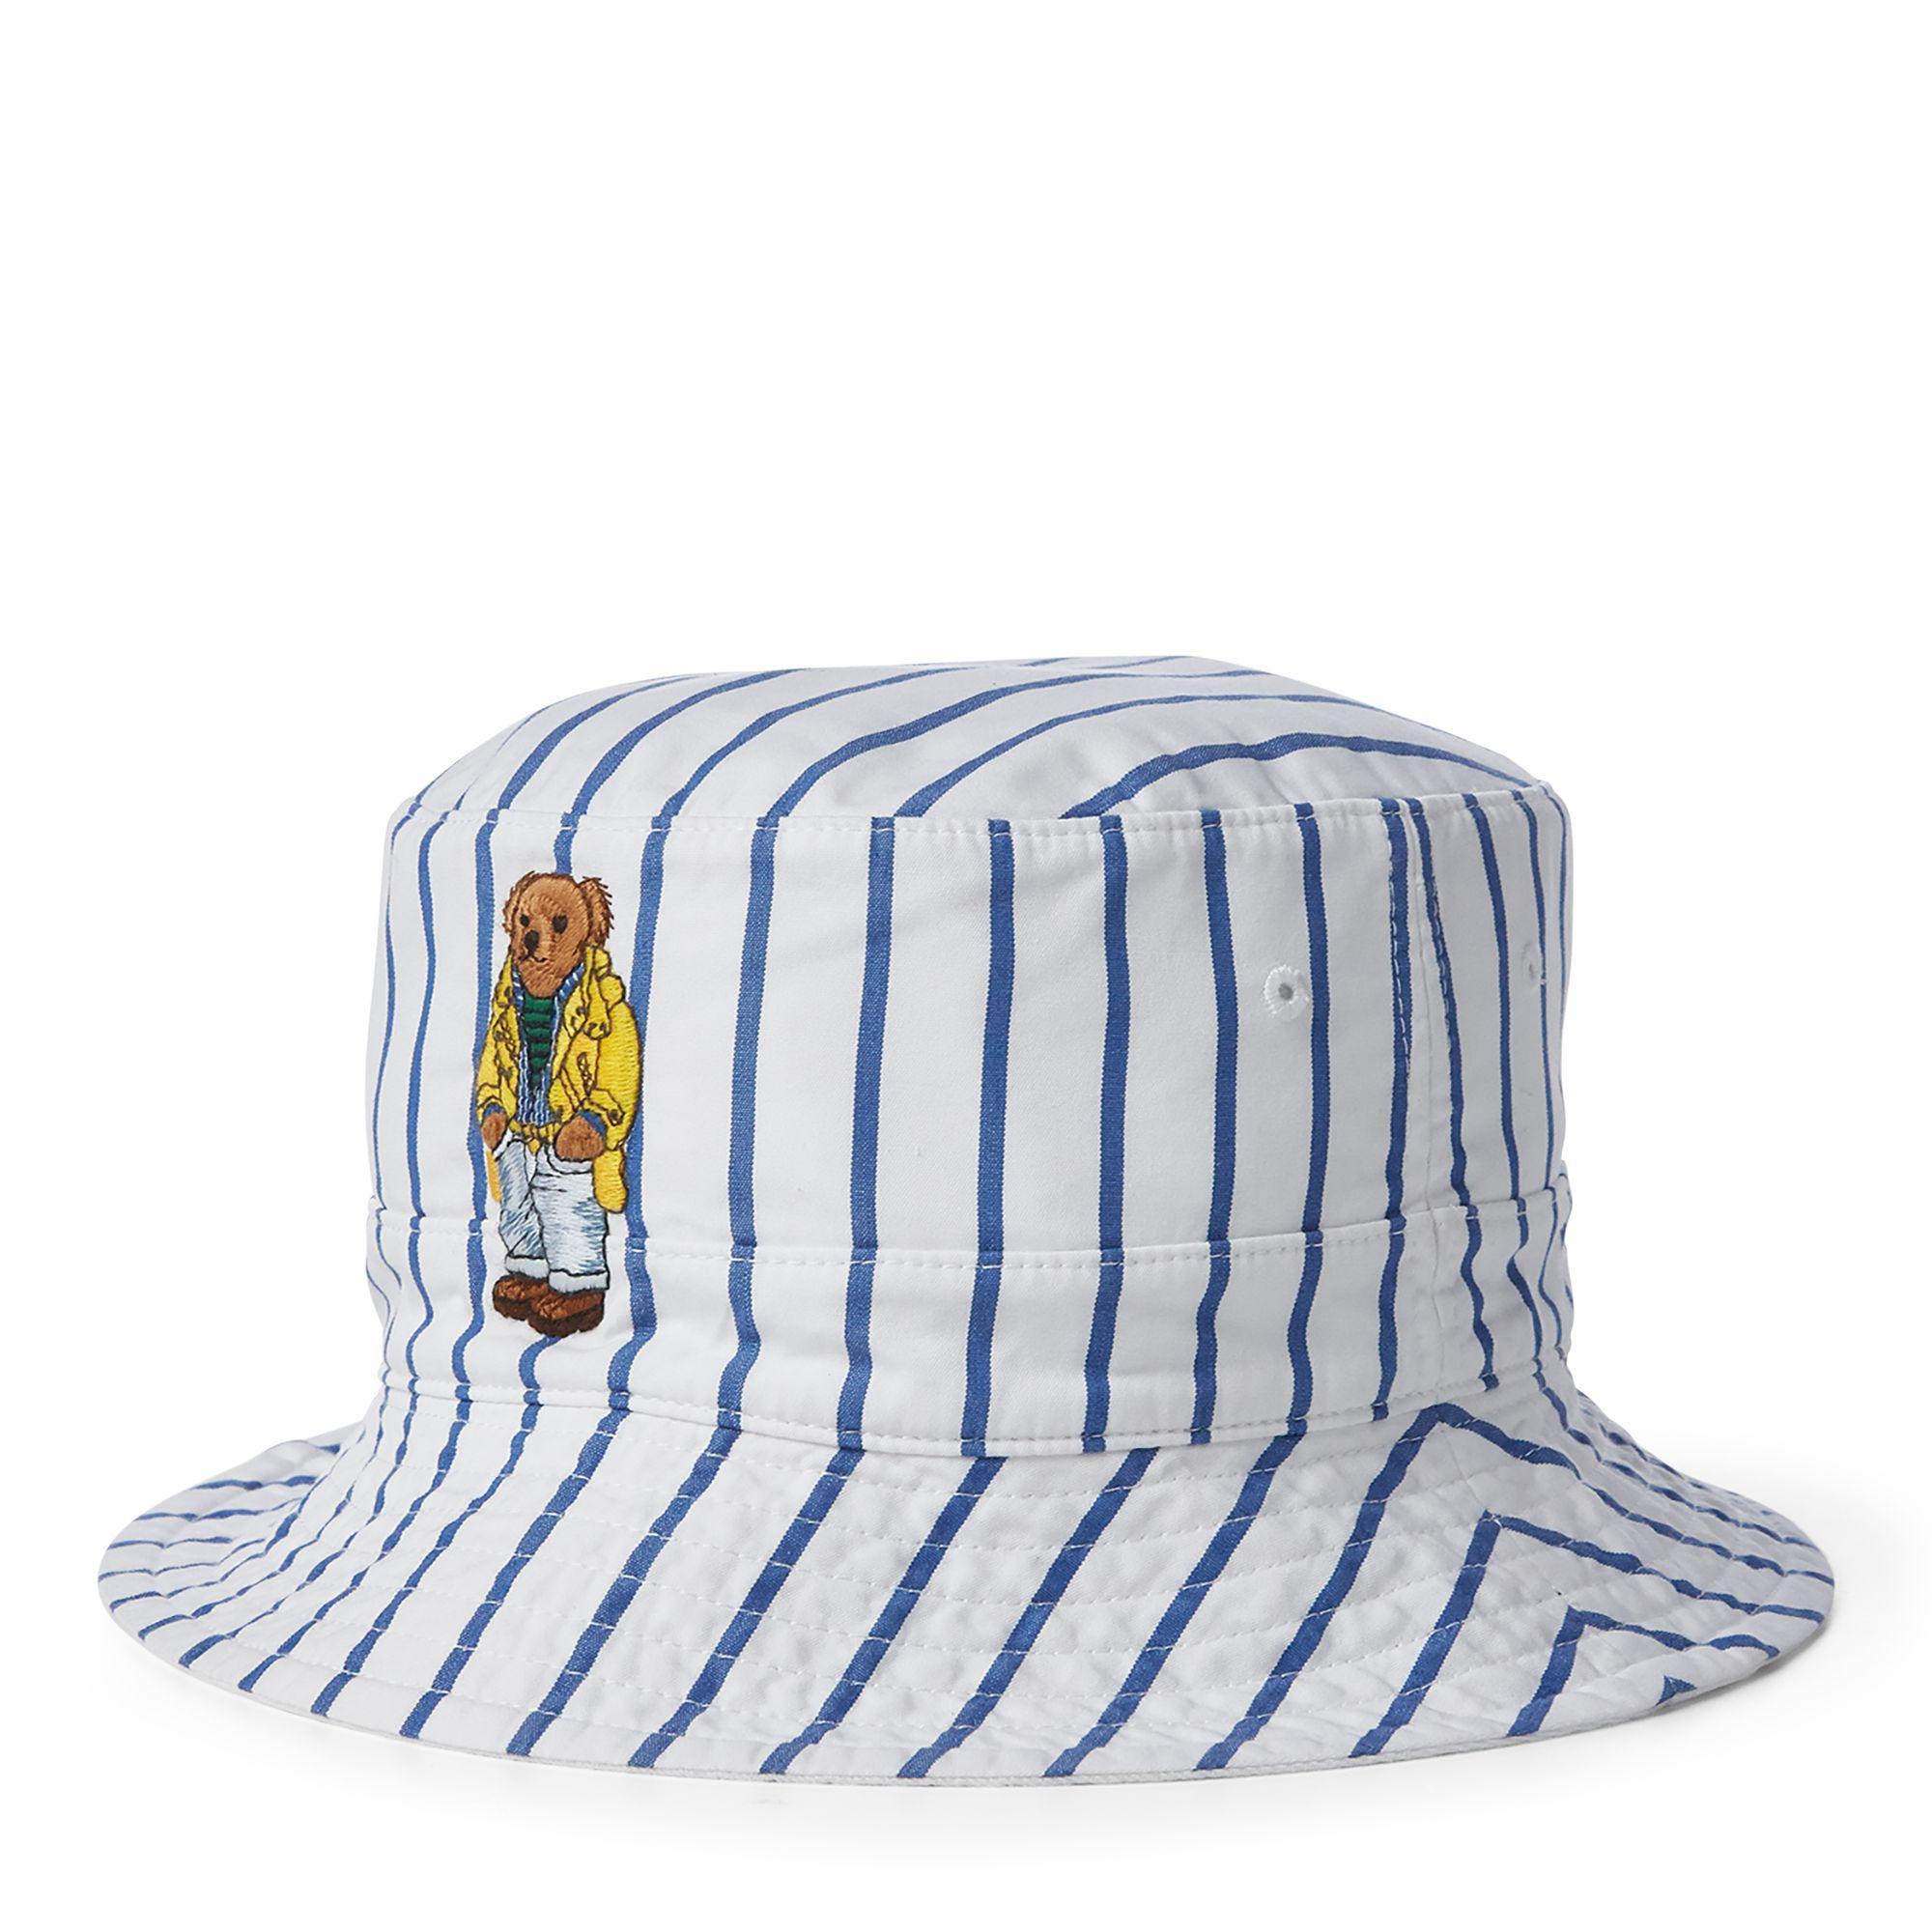 929e94da334 Polo Ralph Lauren Reversible Crested Bucket Hat in Blue for Men - Lyst